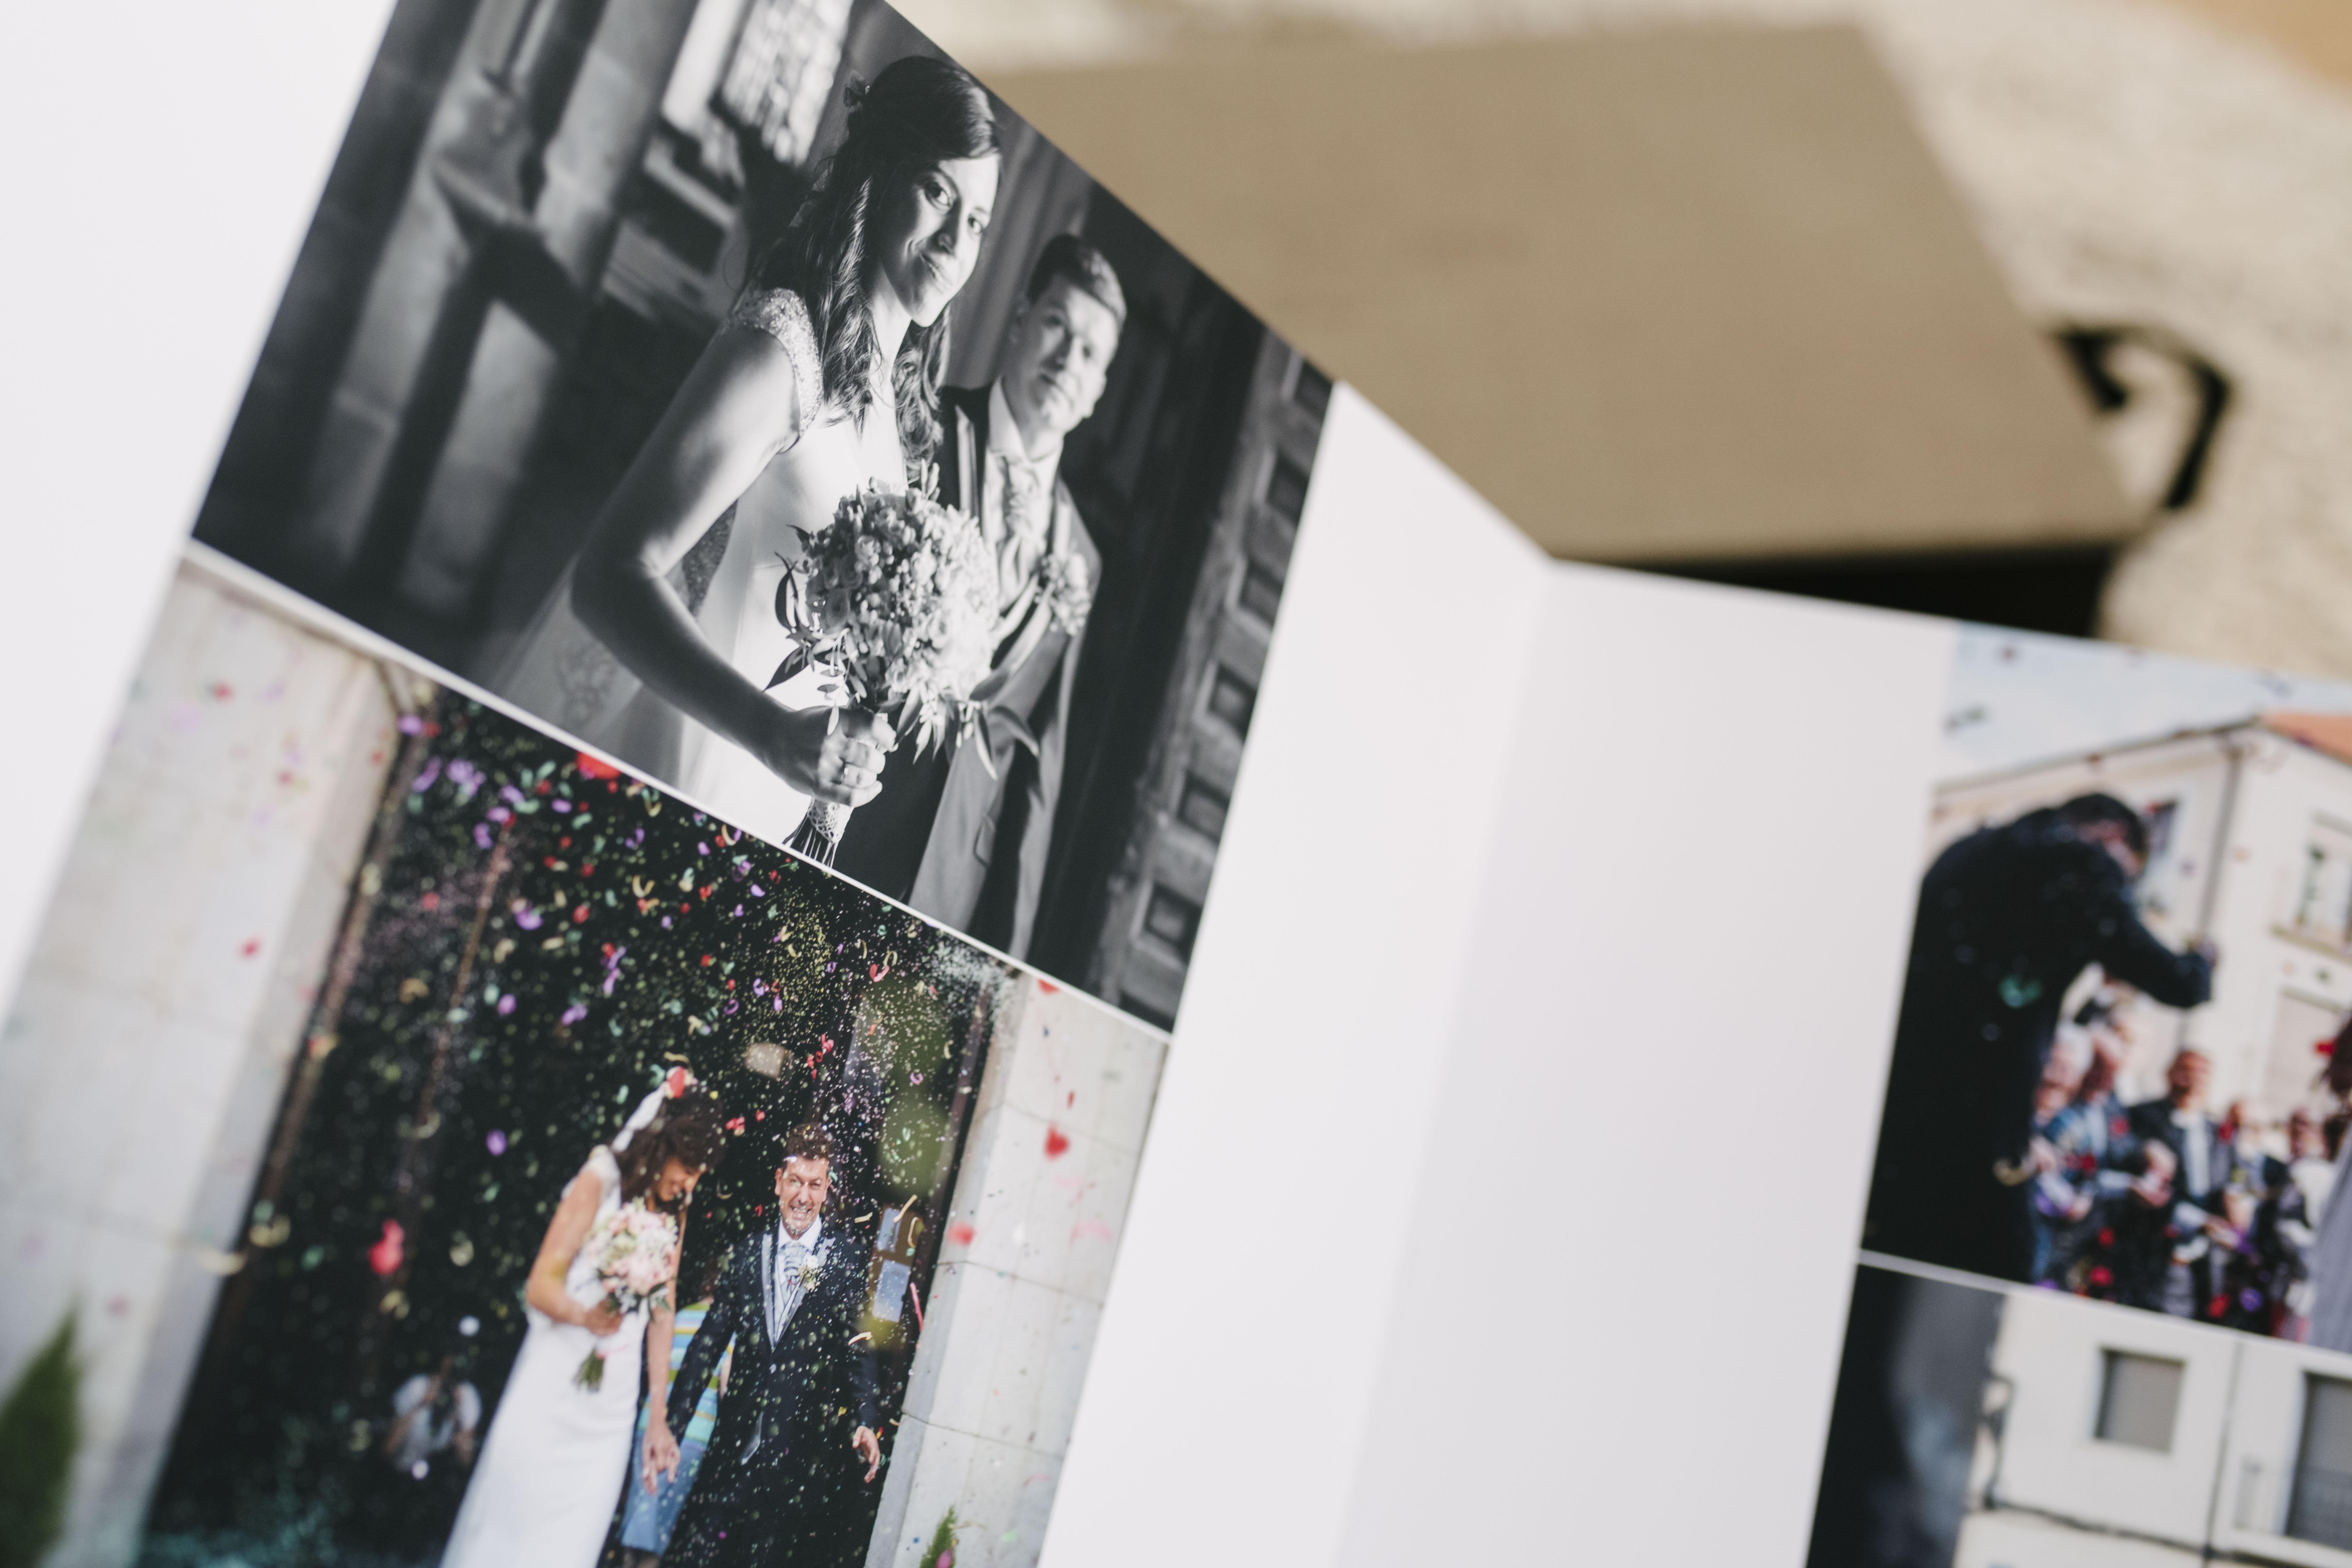 album bodas impresion fotografia impresa fotógrafa milena martinez calidad floricolor retro coleccion tela alta calidad